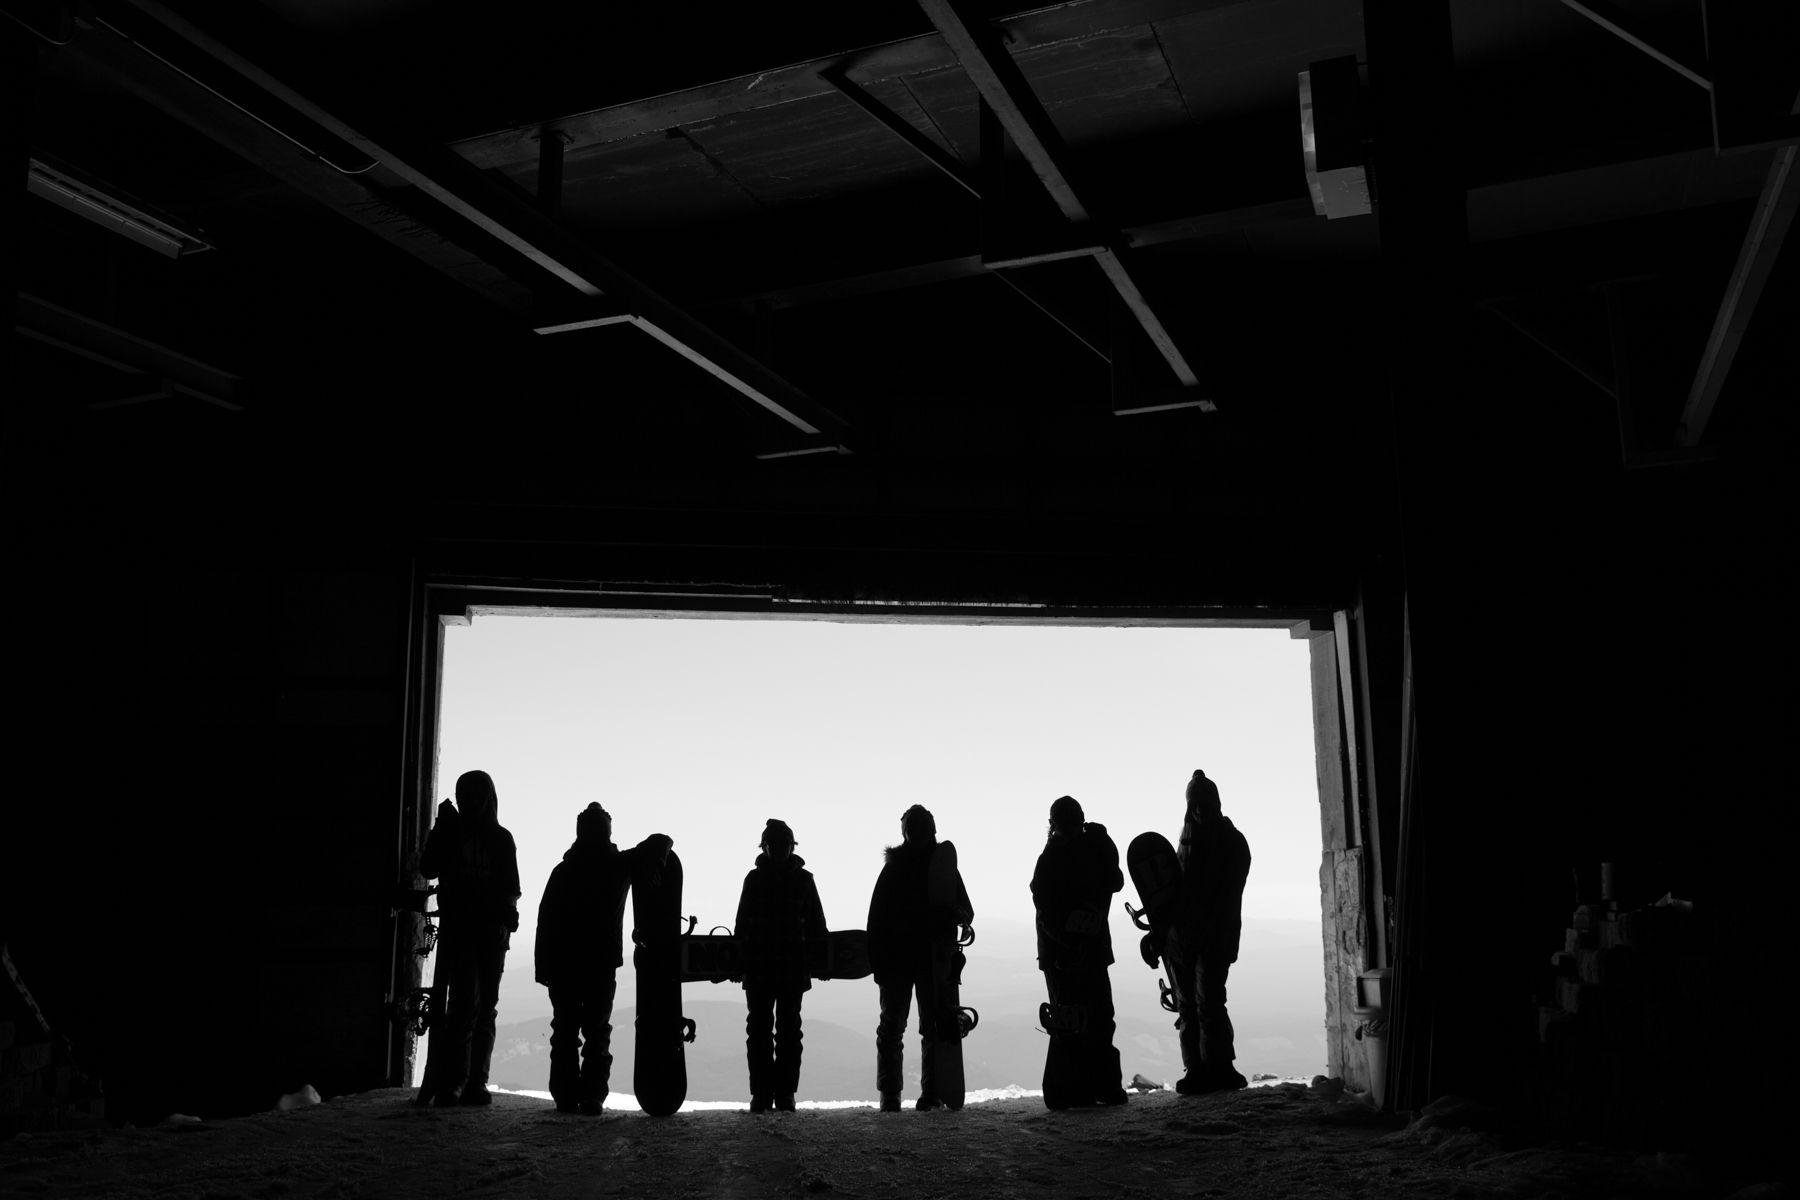 Silhouette of Crew